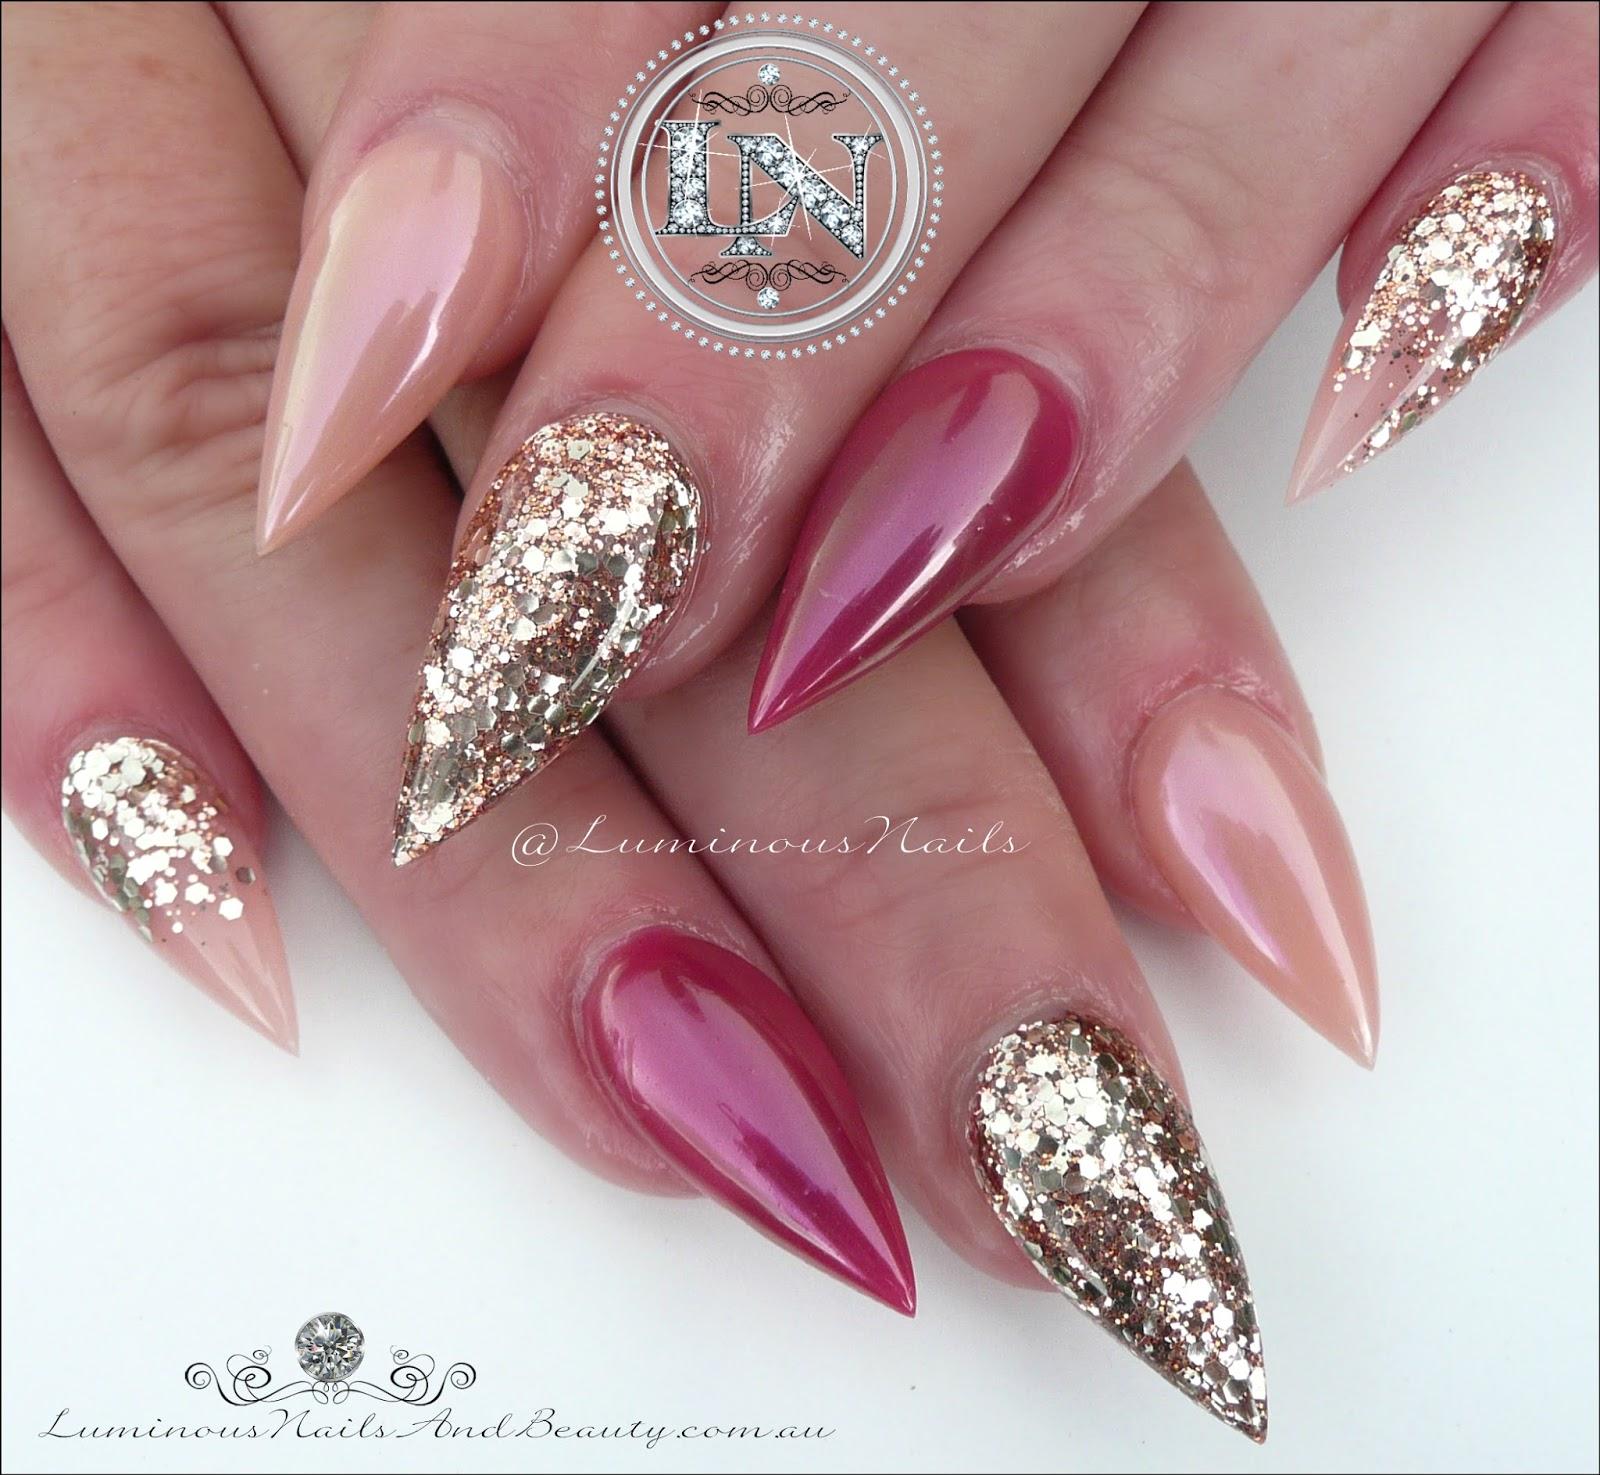 Stunning Pink Glittery Gold Chrome Acrylic Nails